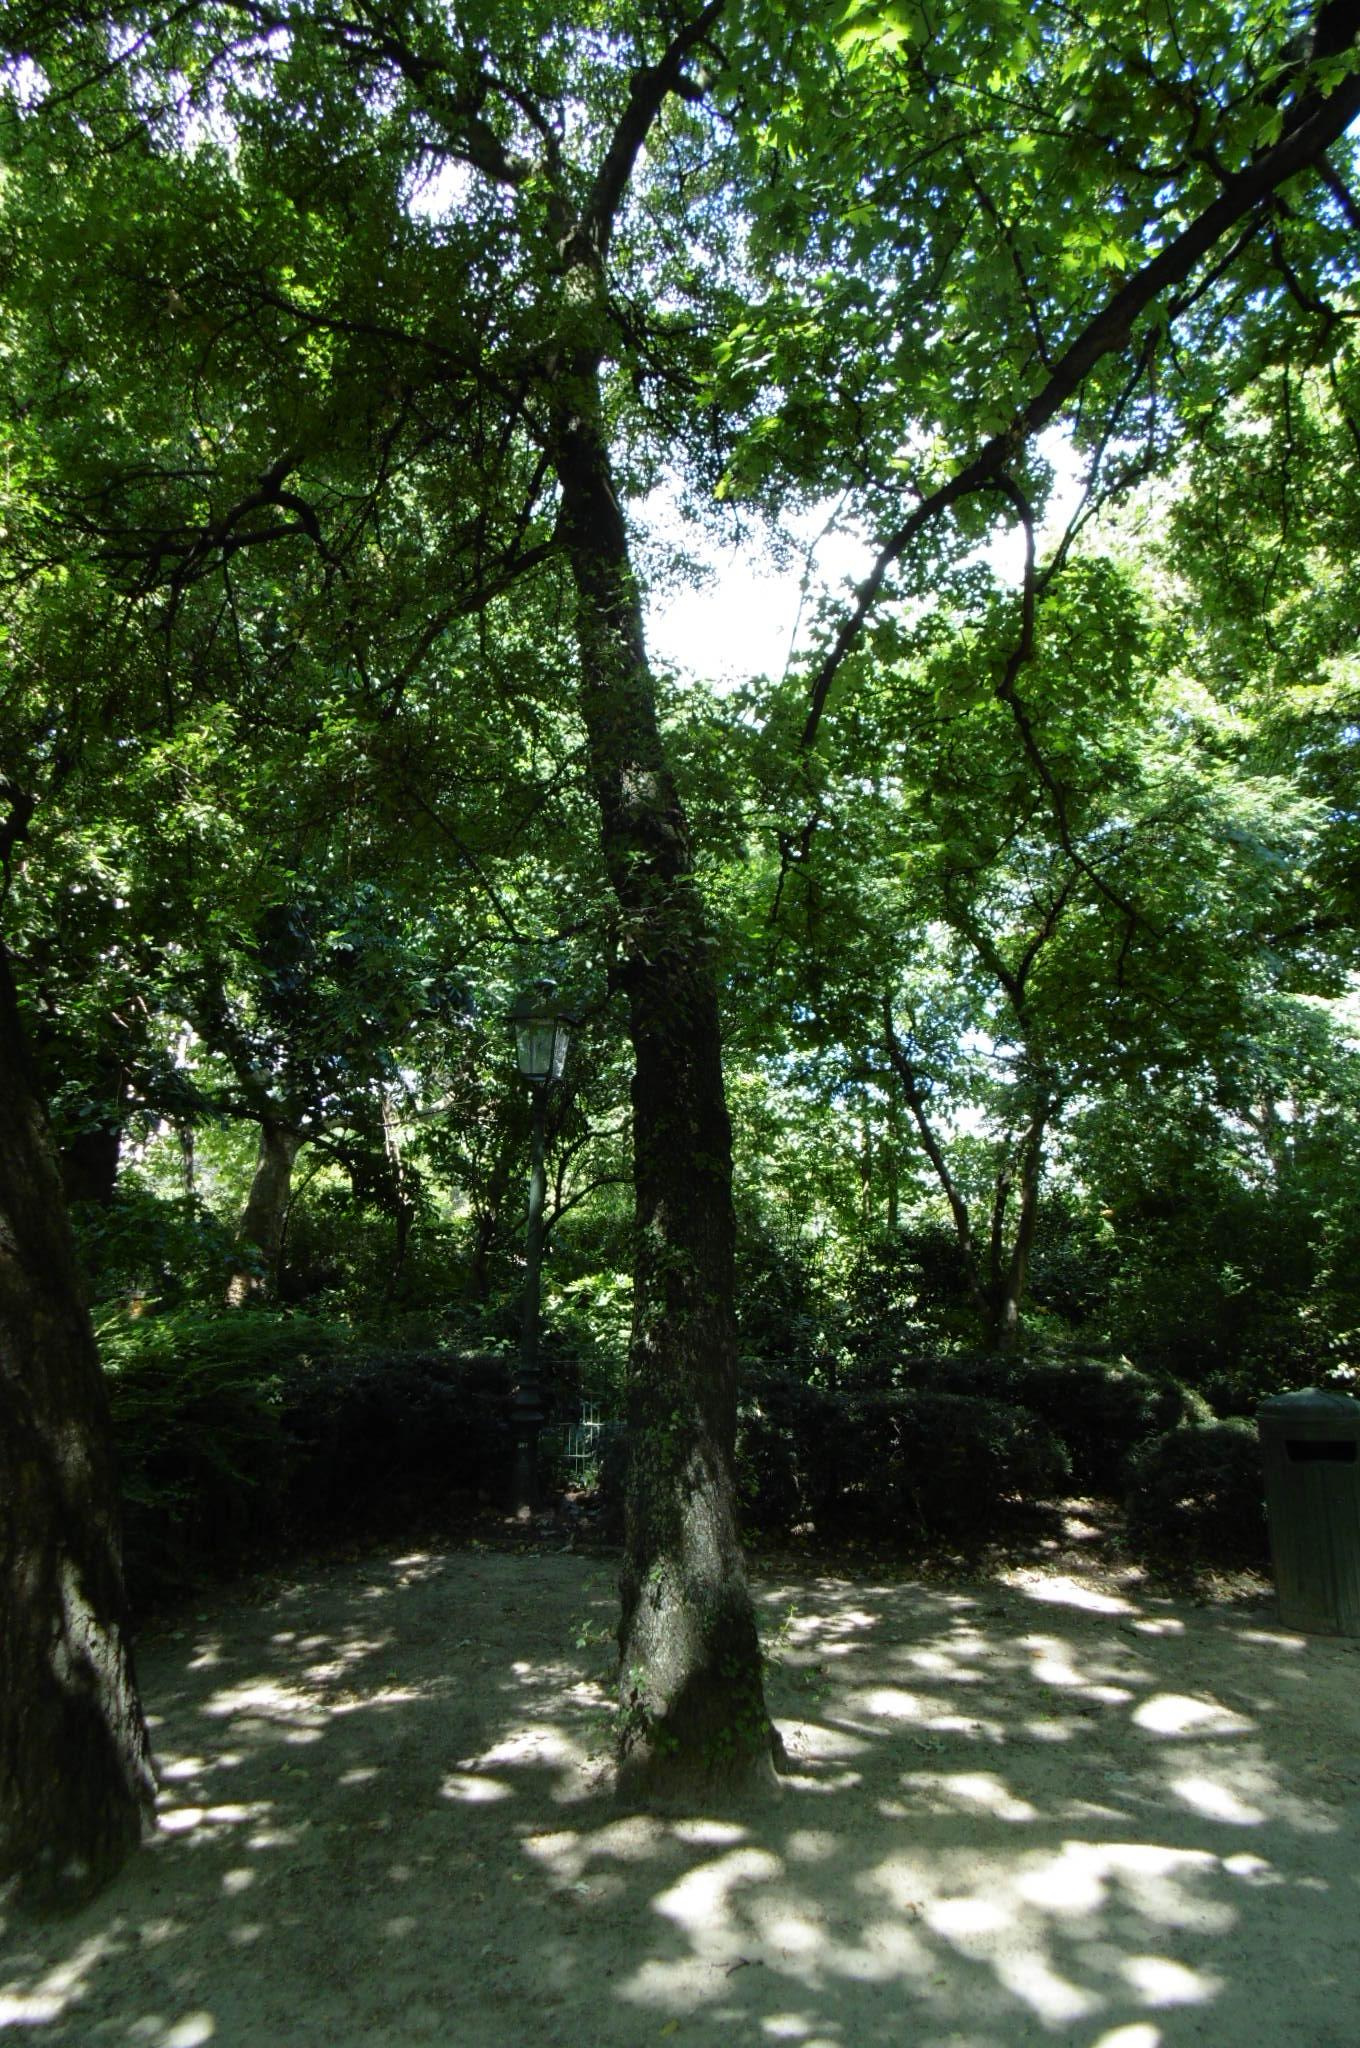 Erable de Montpellier – Saint-Josse-Ten-Noode, Jardin Botanique –  03 Juillet 2019